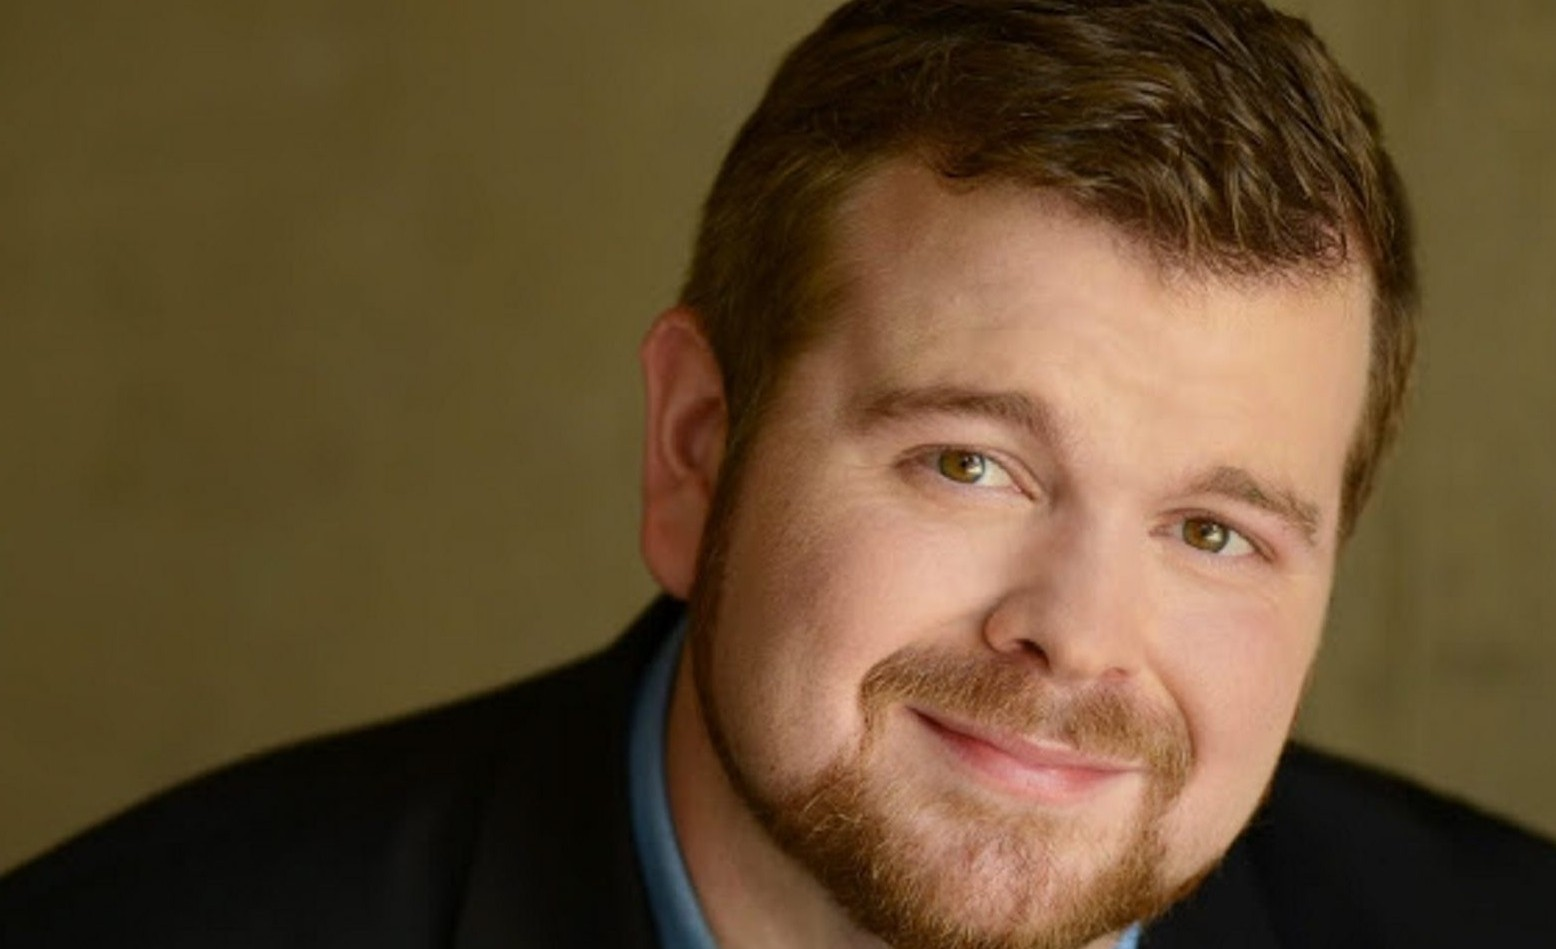 Kyle Van Schoonhoven of Lockport is one of three recent SUNY Fredonia State grads chosen for the prestigious Merola Opera Program.